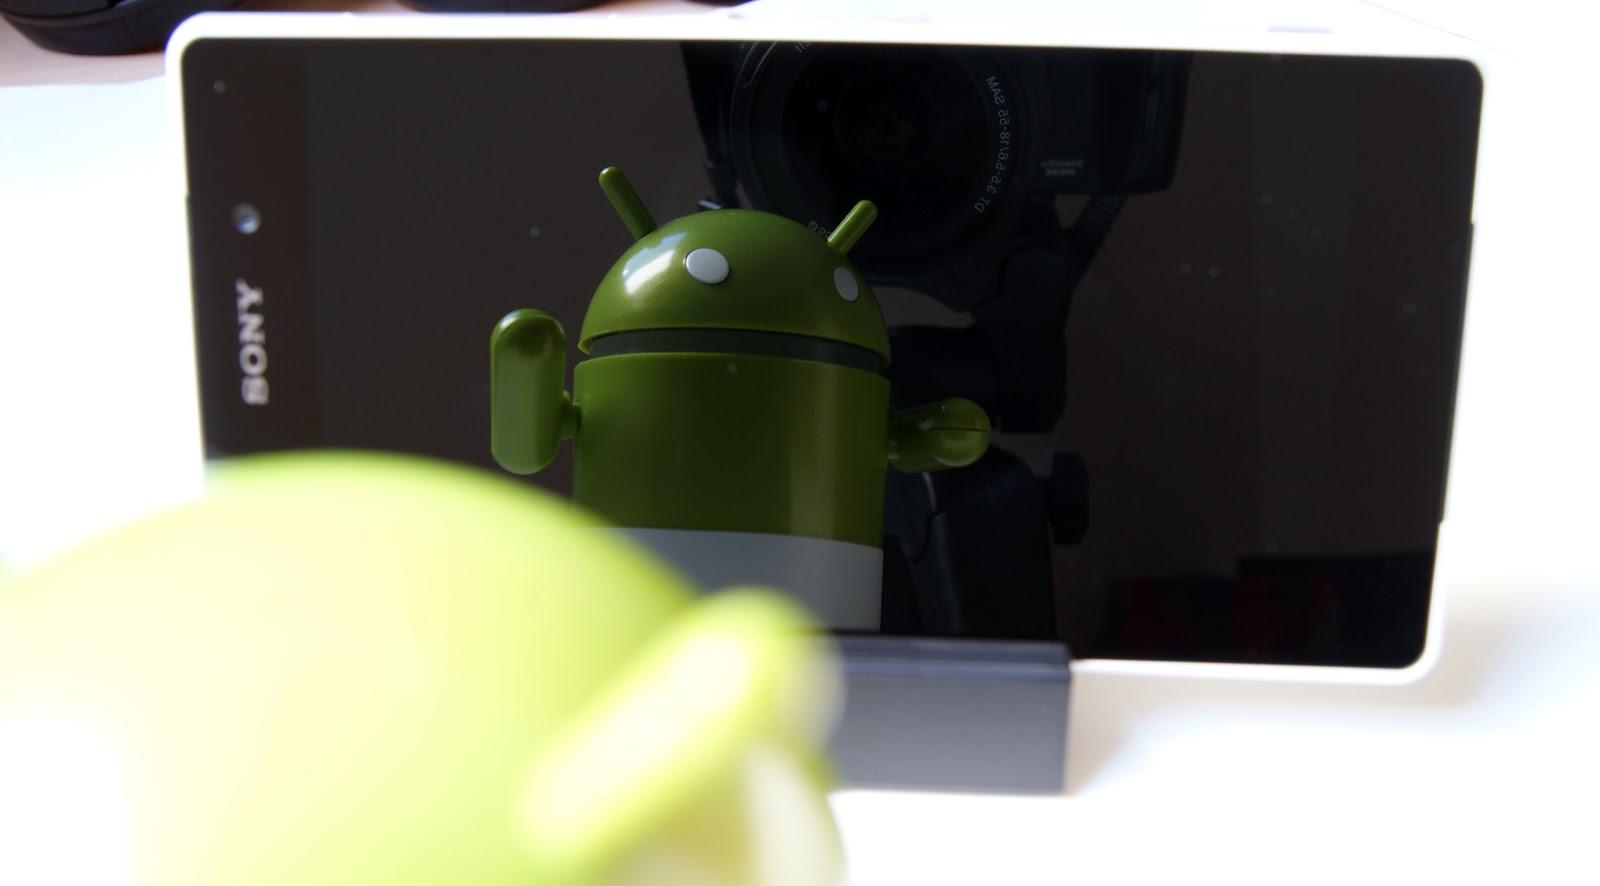 Sony Xperia Z2 - cristal de la pantalla reflectante